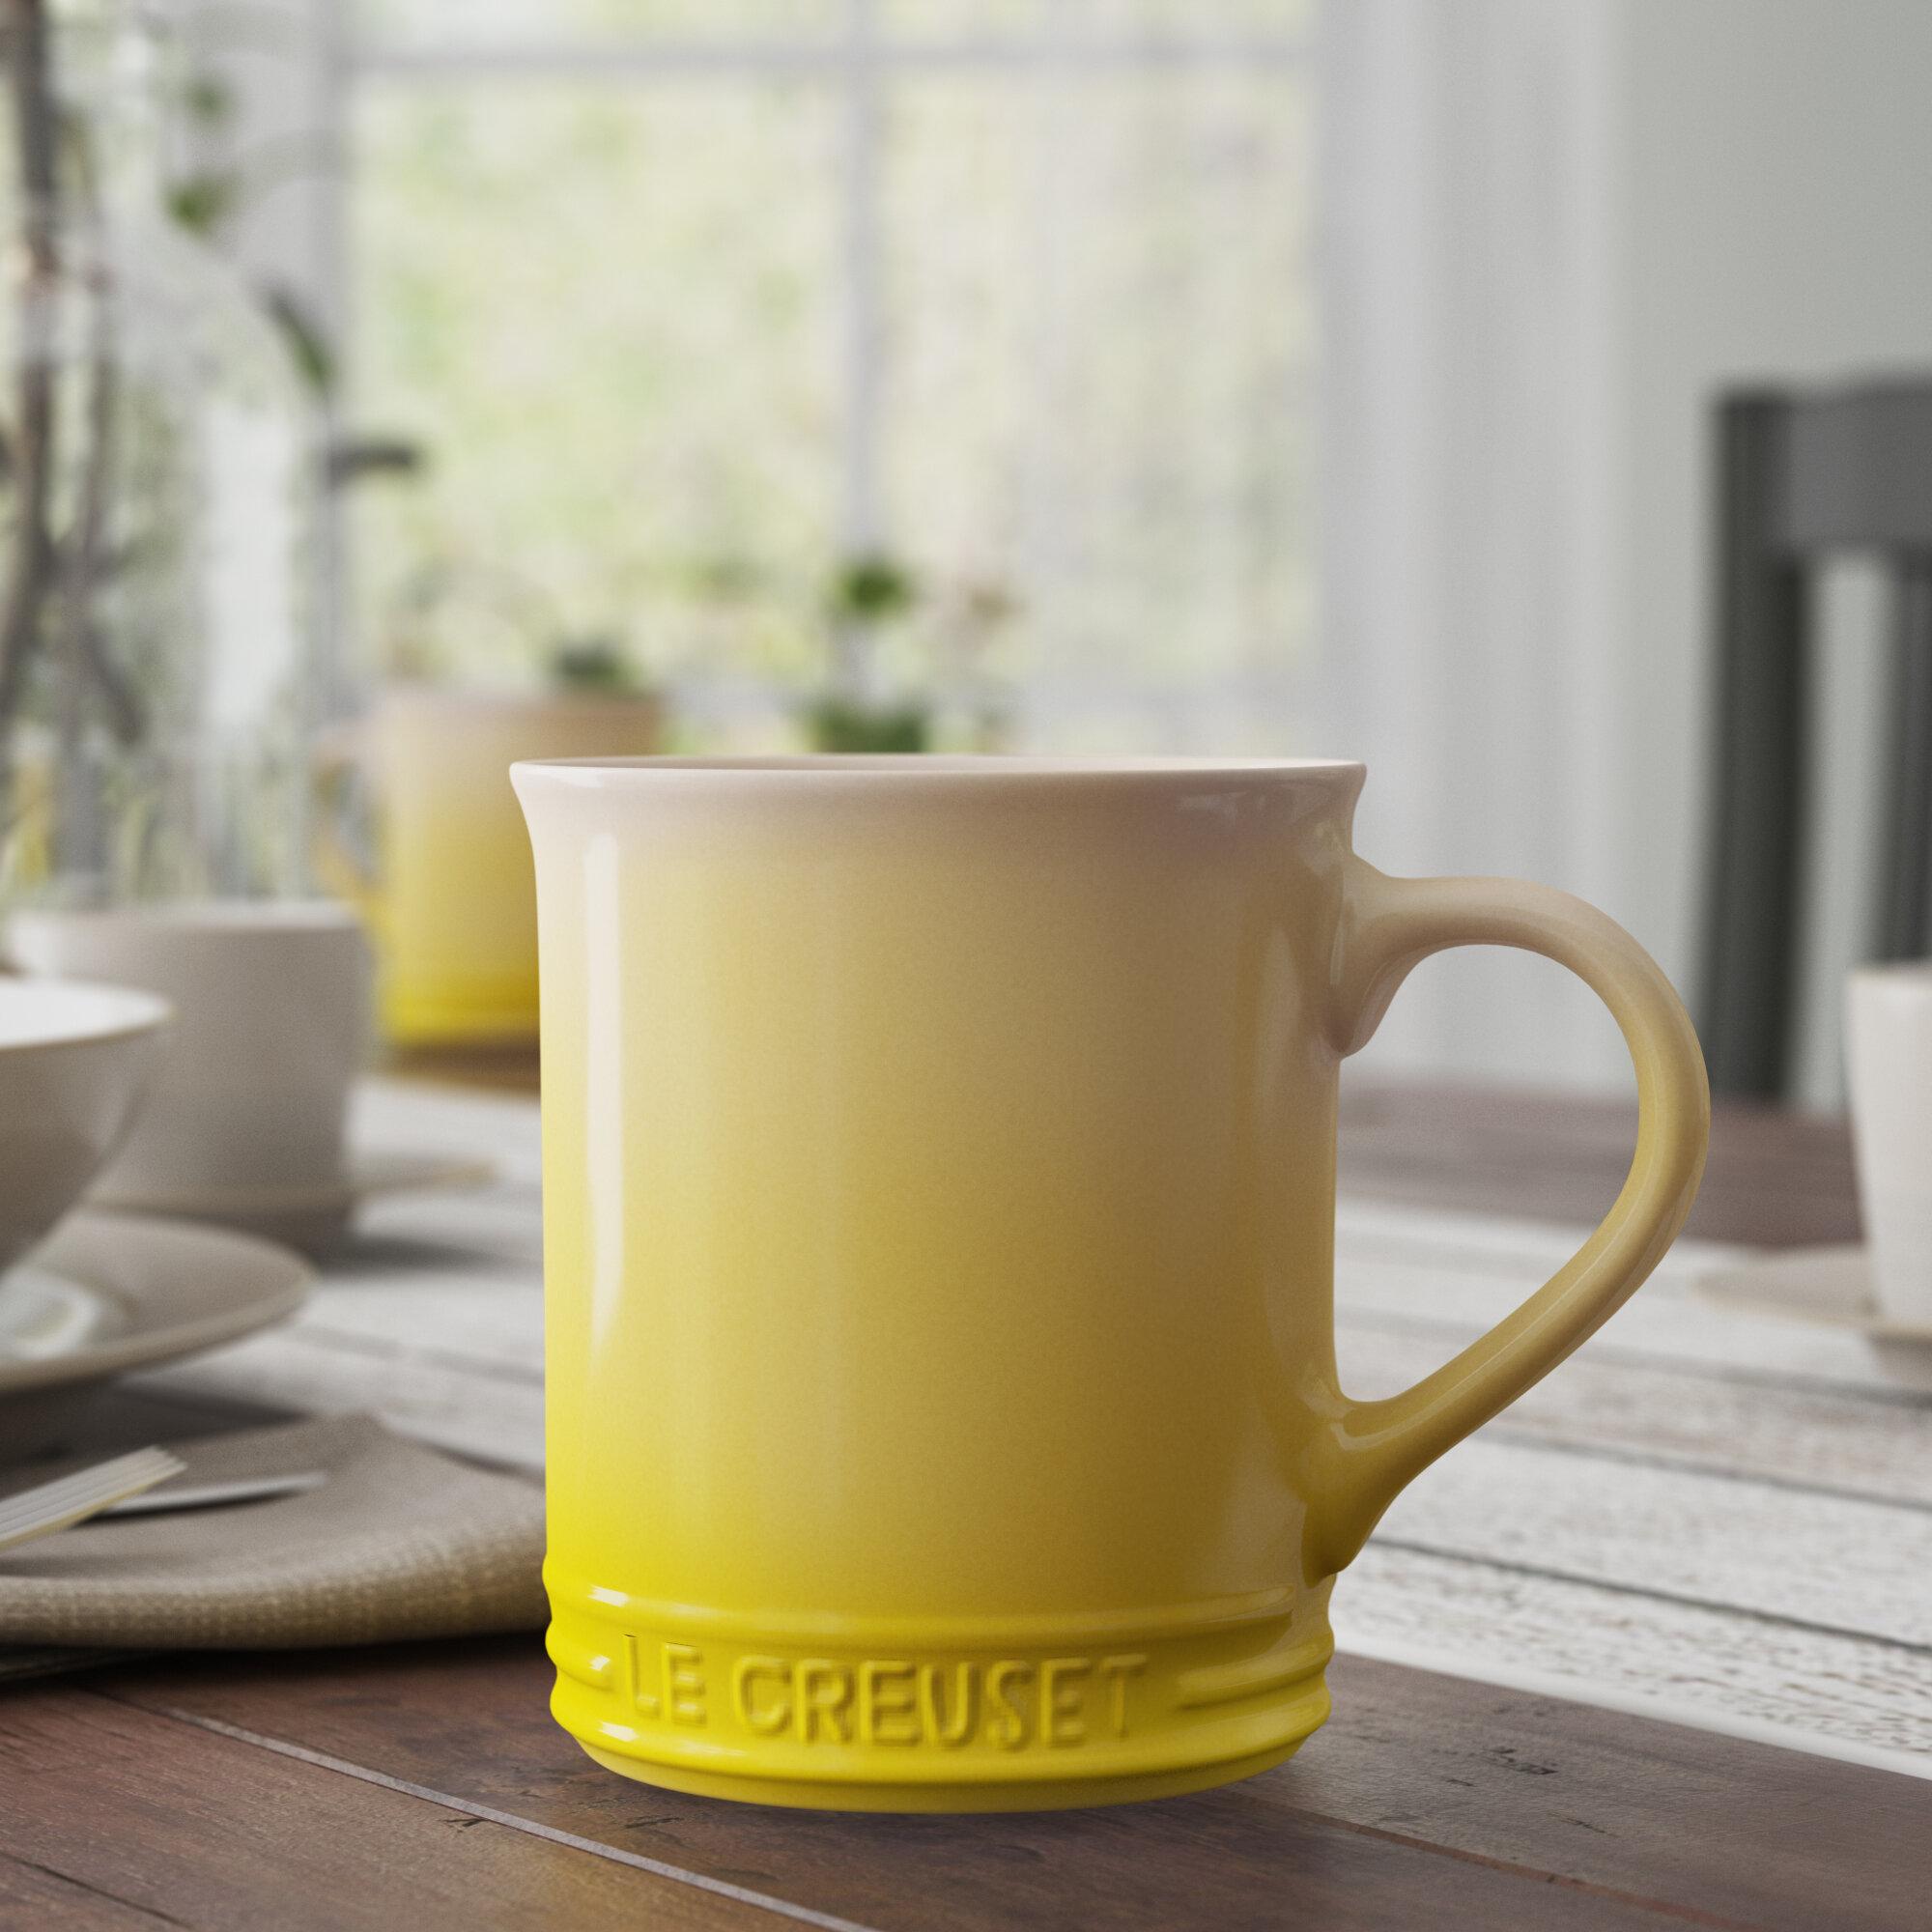 Le Creuset Stoneware Coffee Mug Reviews Wayfair